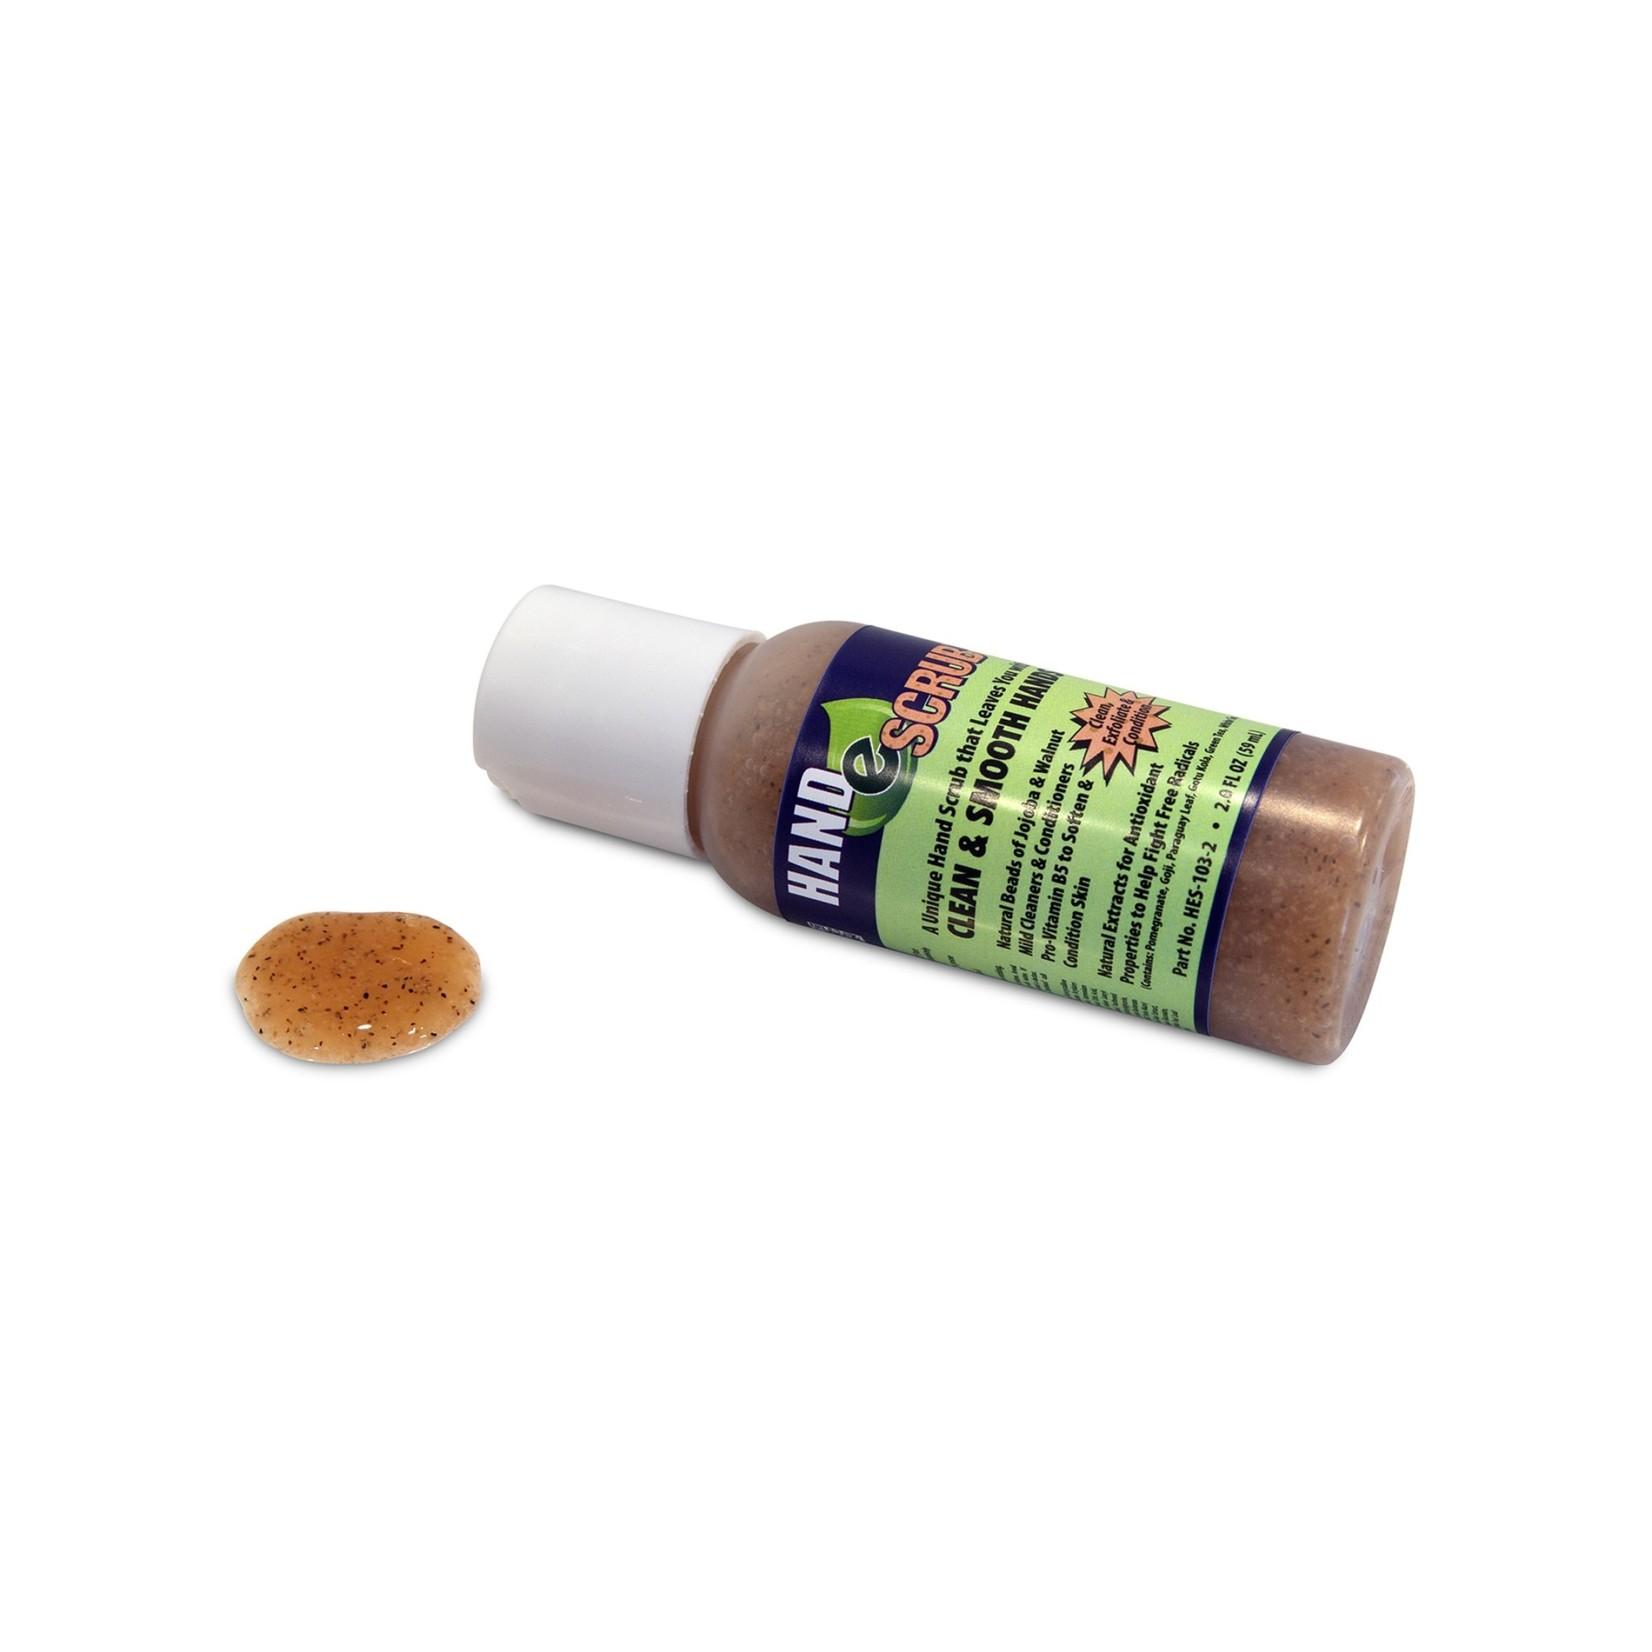 CAIG Laboratories Hand-e-Scrub DIY Professional Hand Scrub, 2 oz